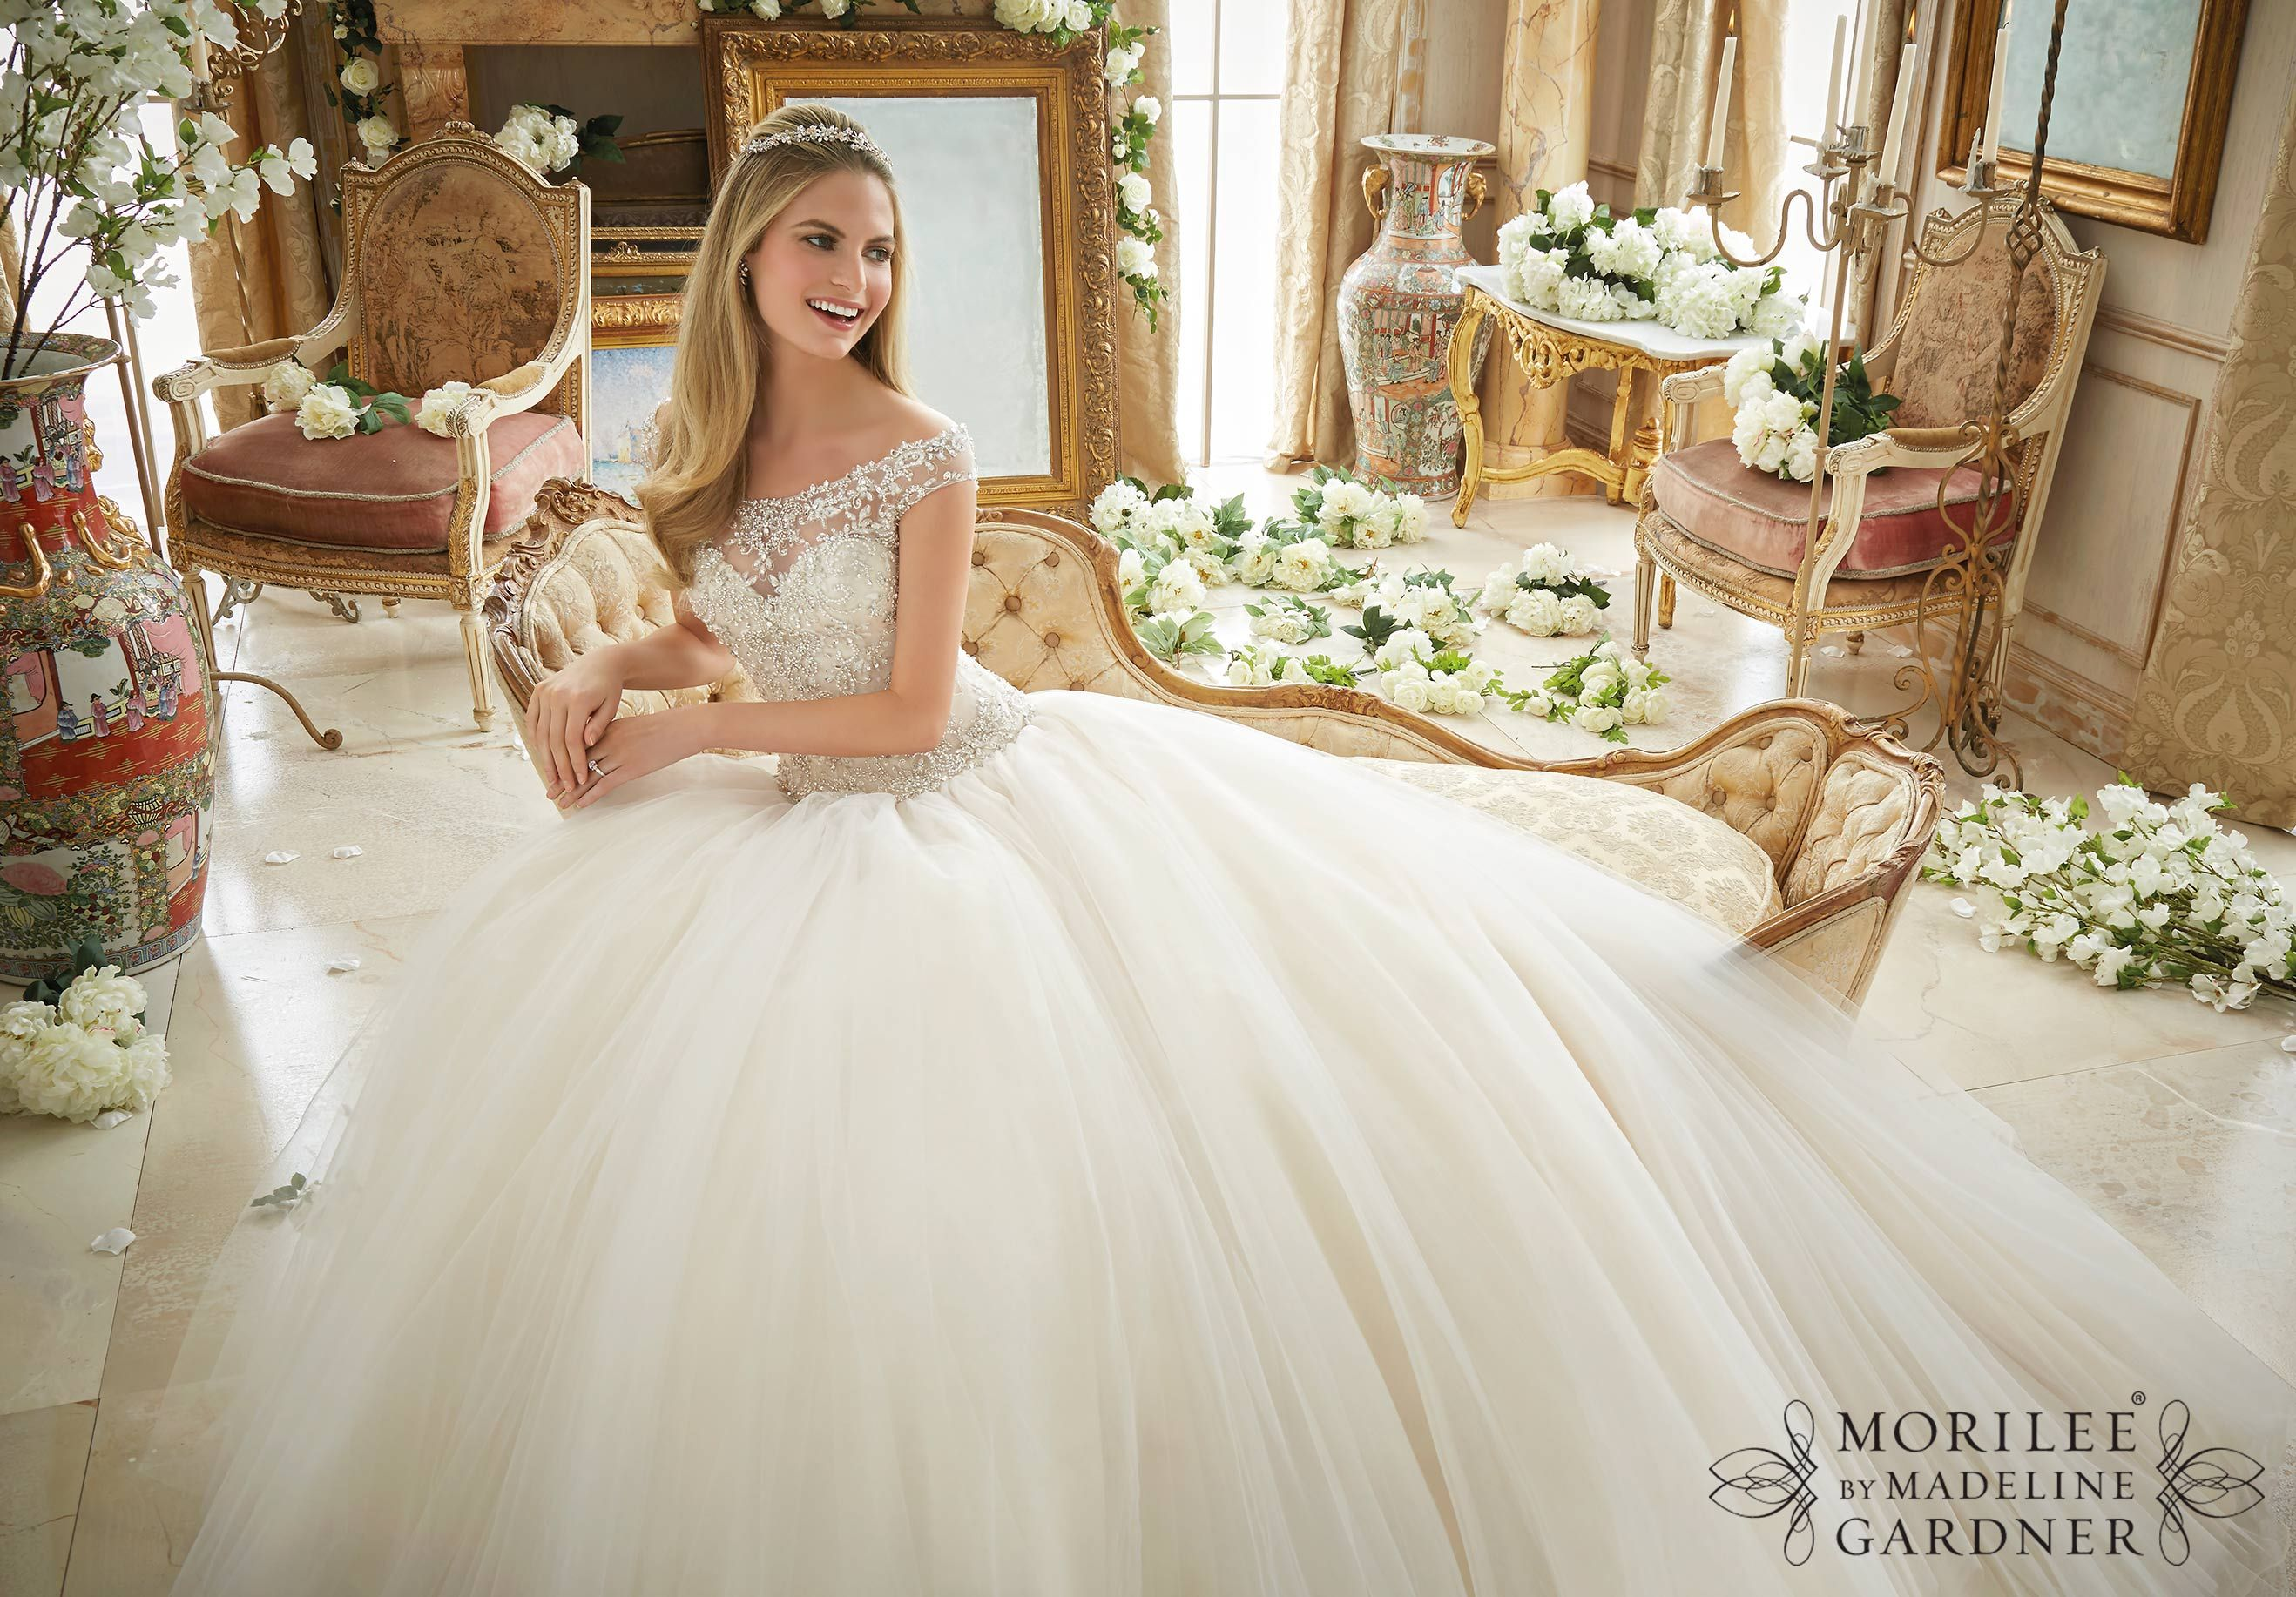 Mori lee madeline gardner wedding dress  Wedding Dress  Crystal Beaded Embroidery on Tulle Ball Gown